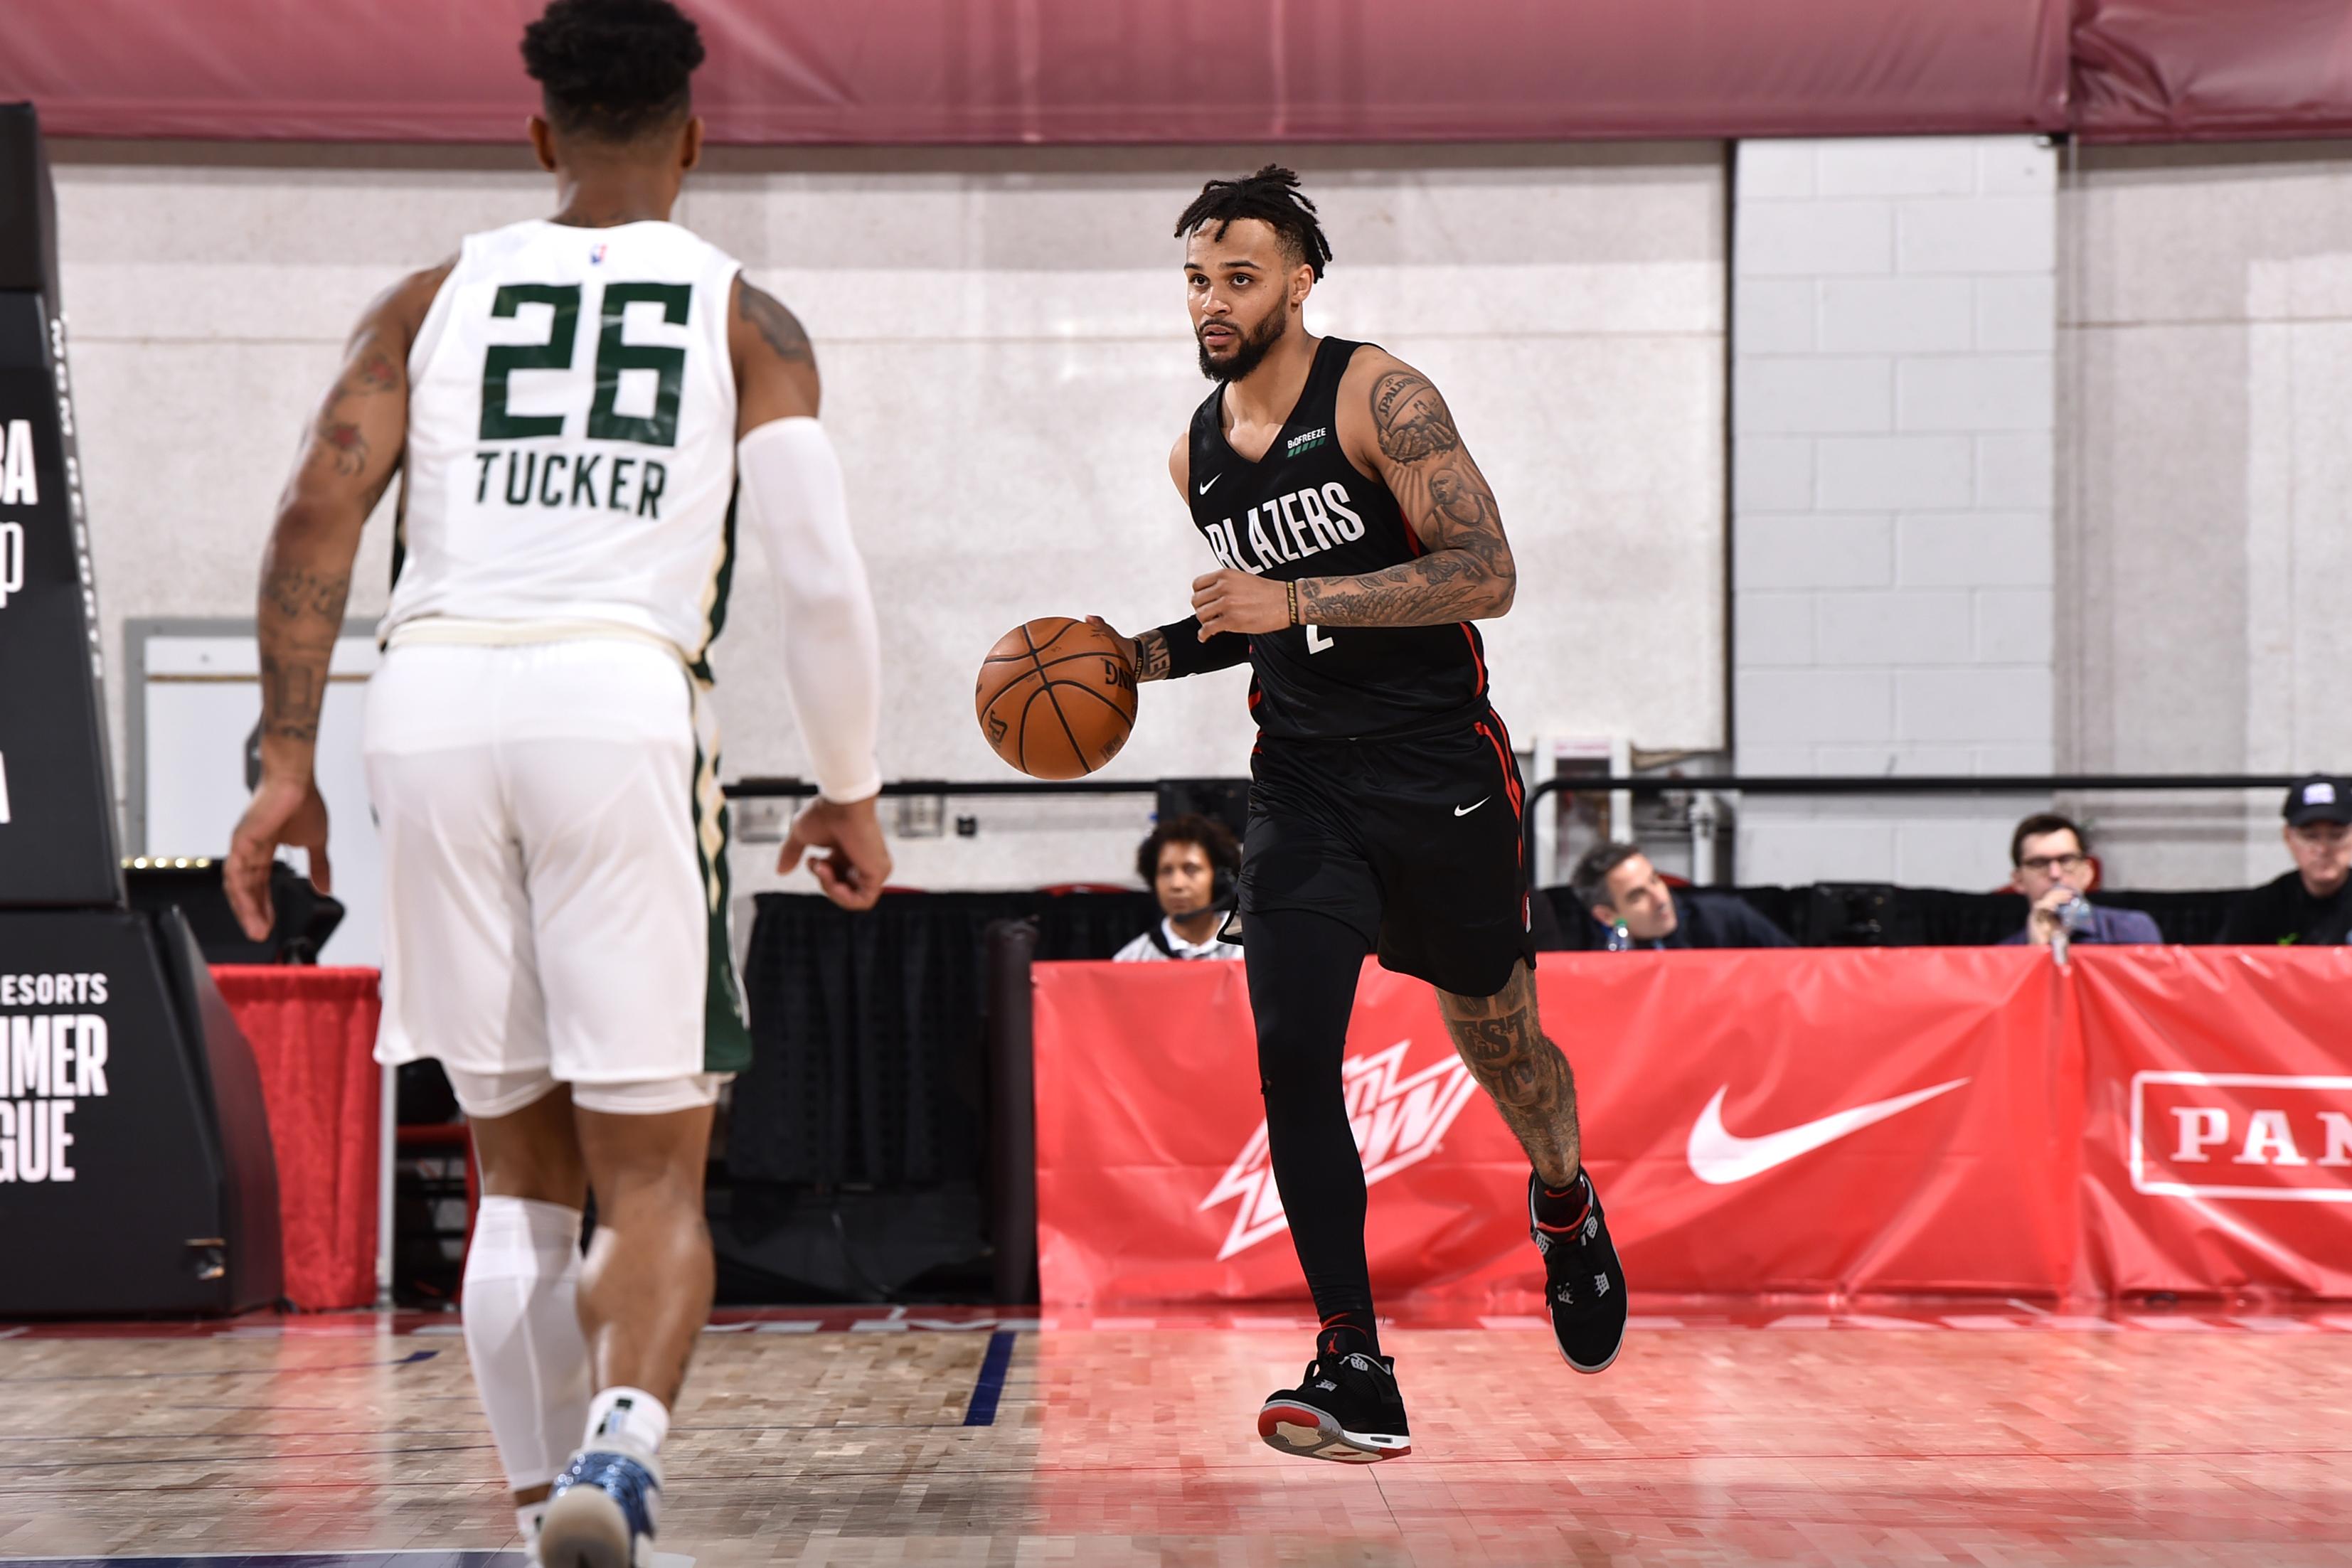 2019 Las Vegas Summer League - Day 8 - Portland Trail Blazers v Milwaukee Bucks